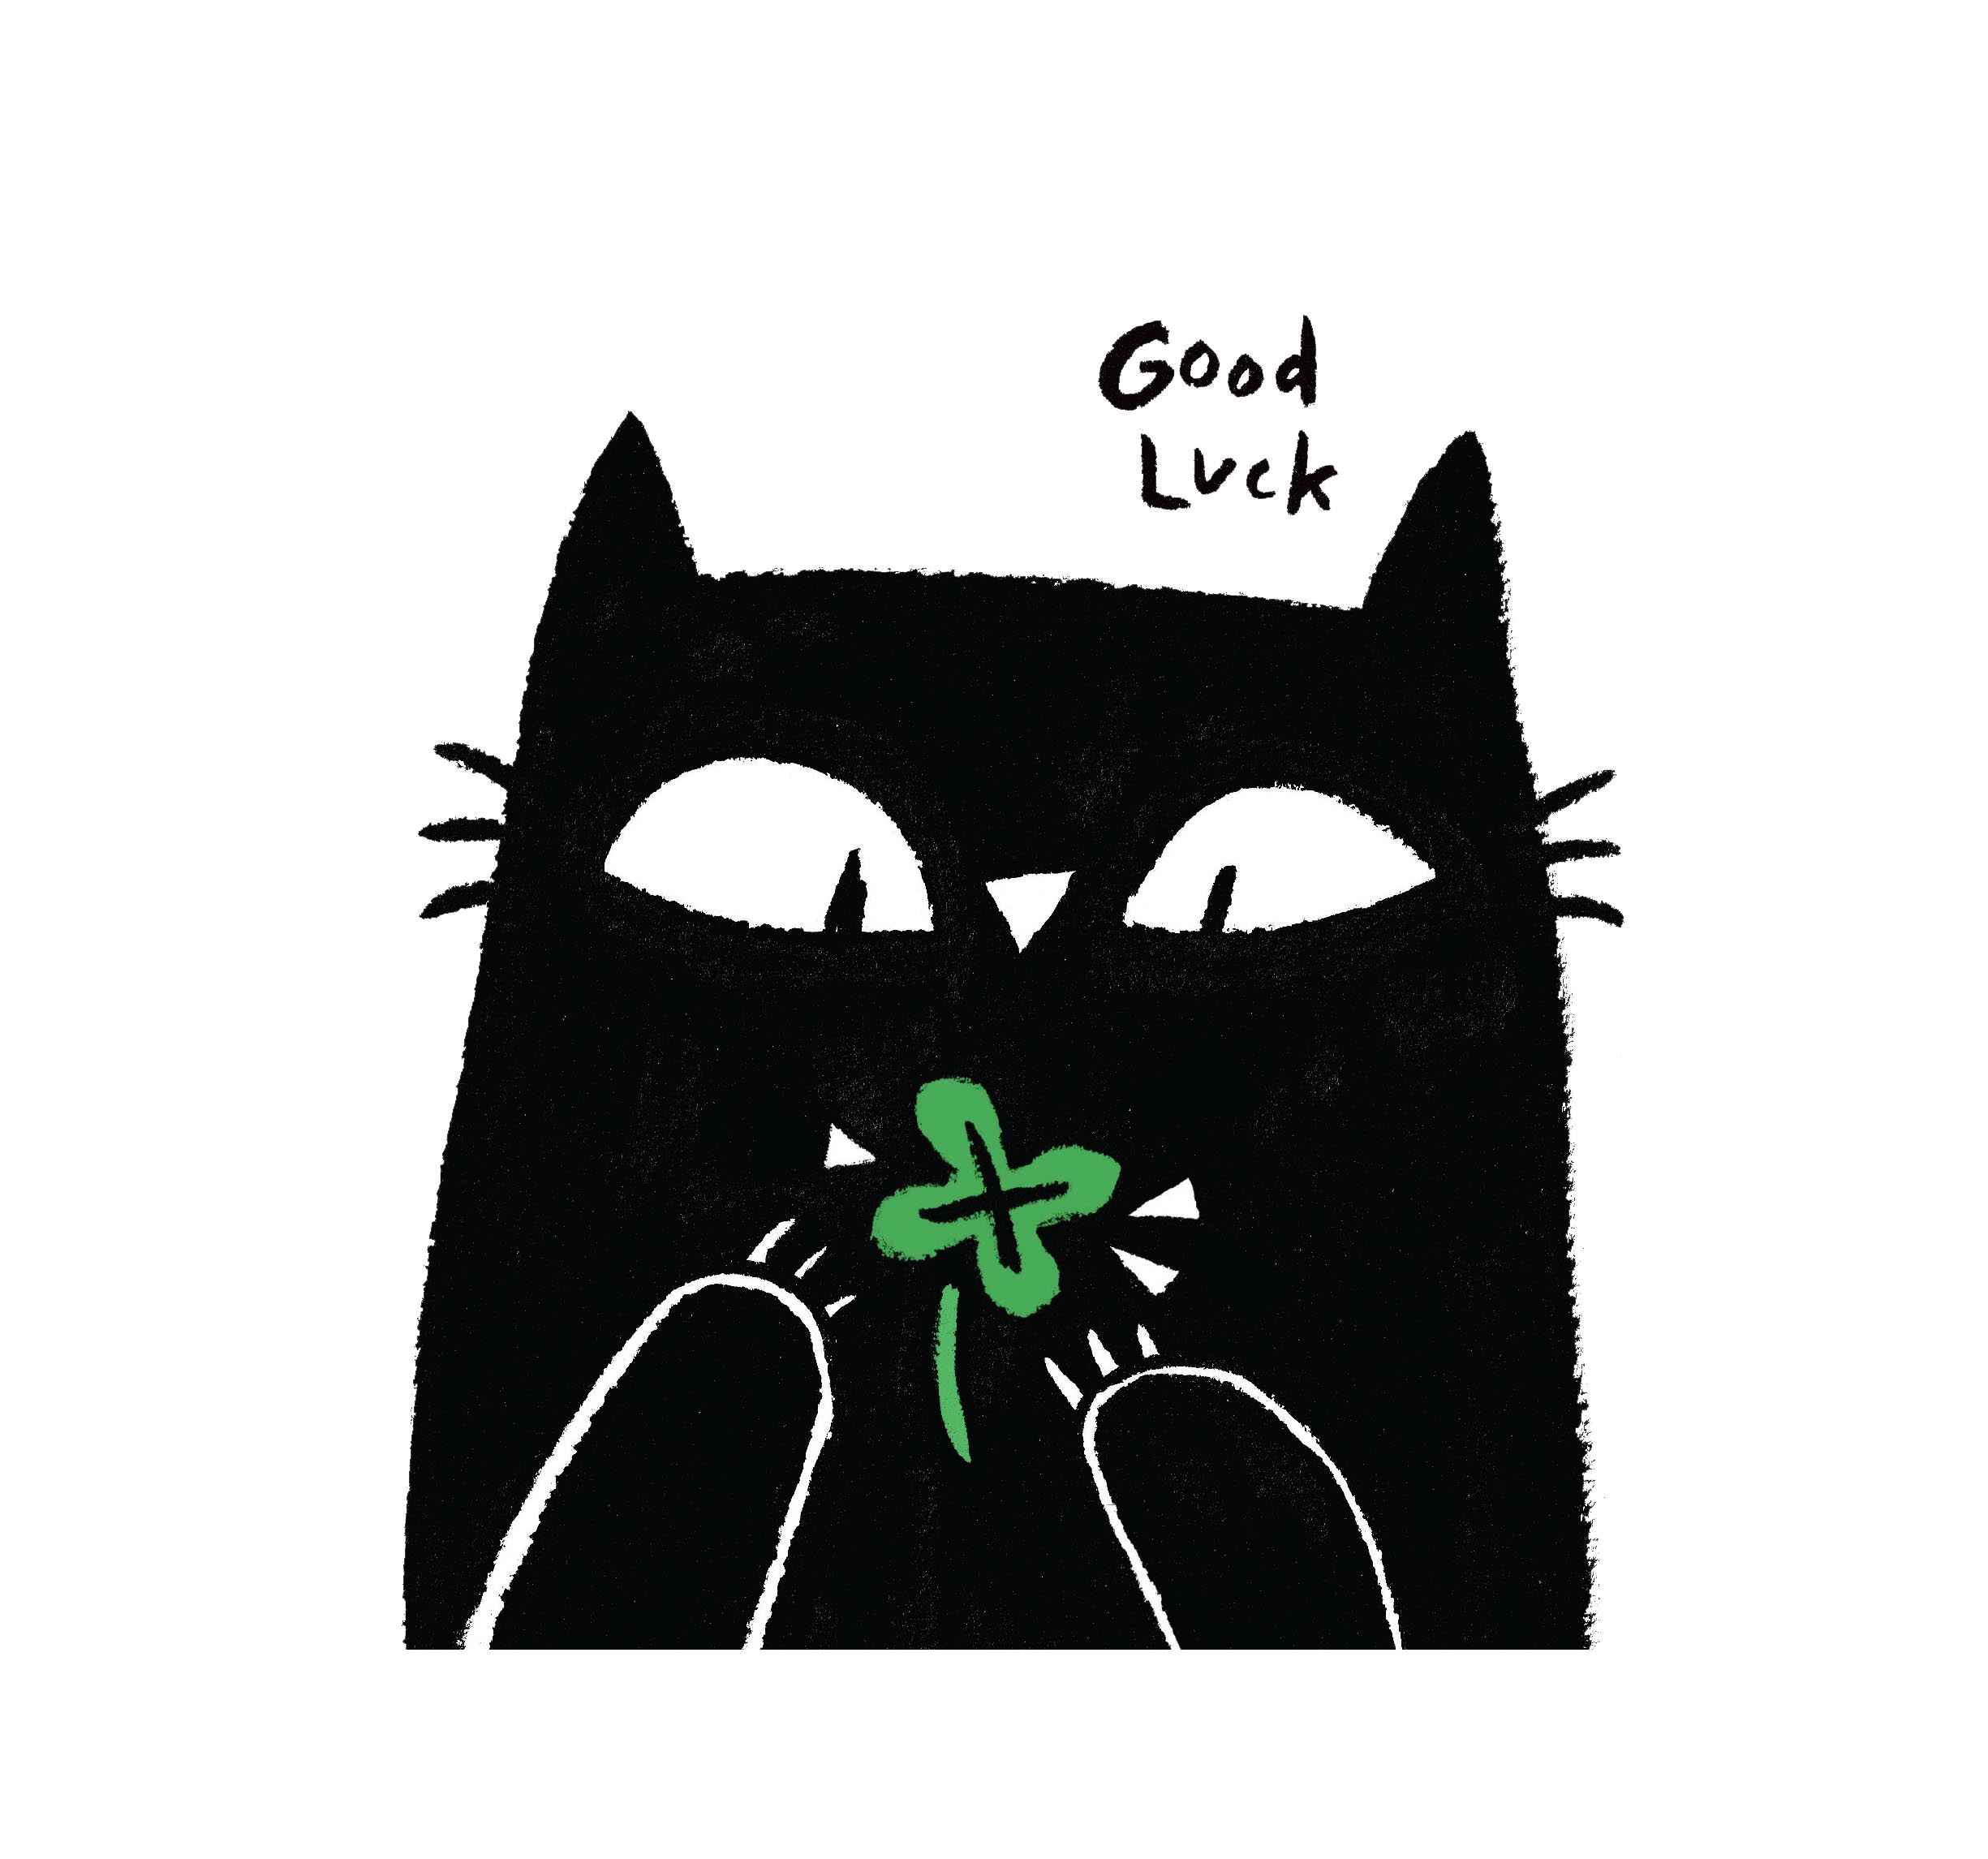 good luck greetings card rachel logan illustration.jpg